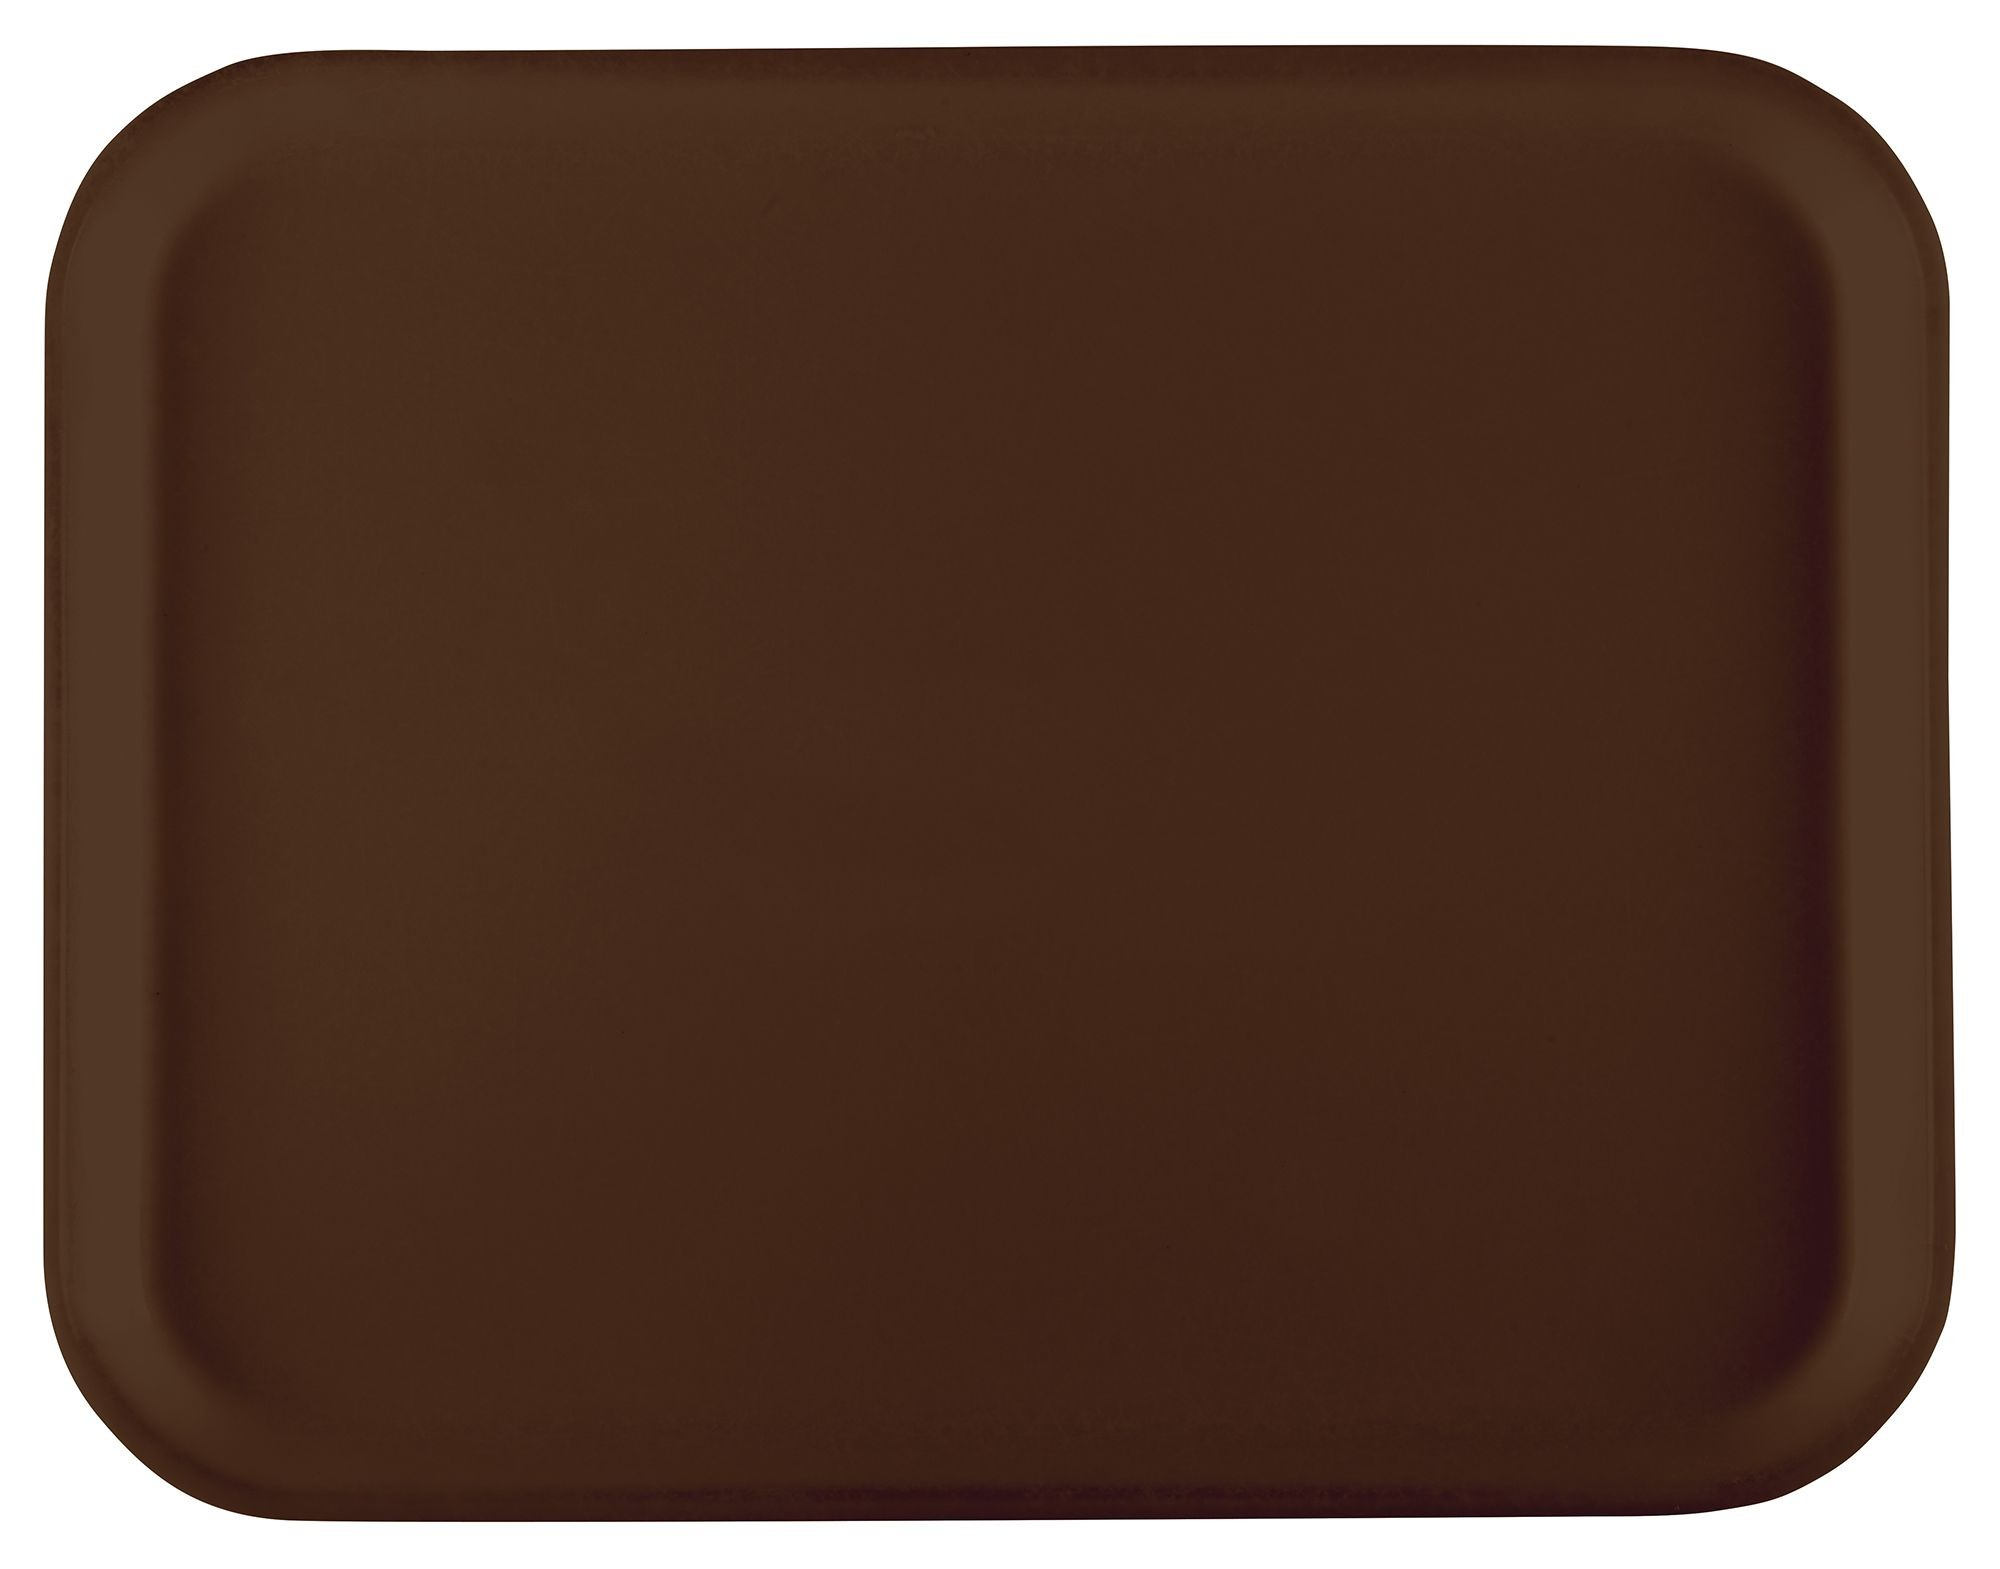 "Winco FGT-1216B Fiberglass Rectangular Tray, Brown, 12"" x 16"""